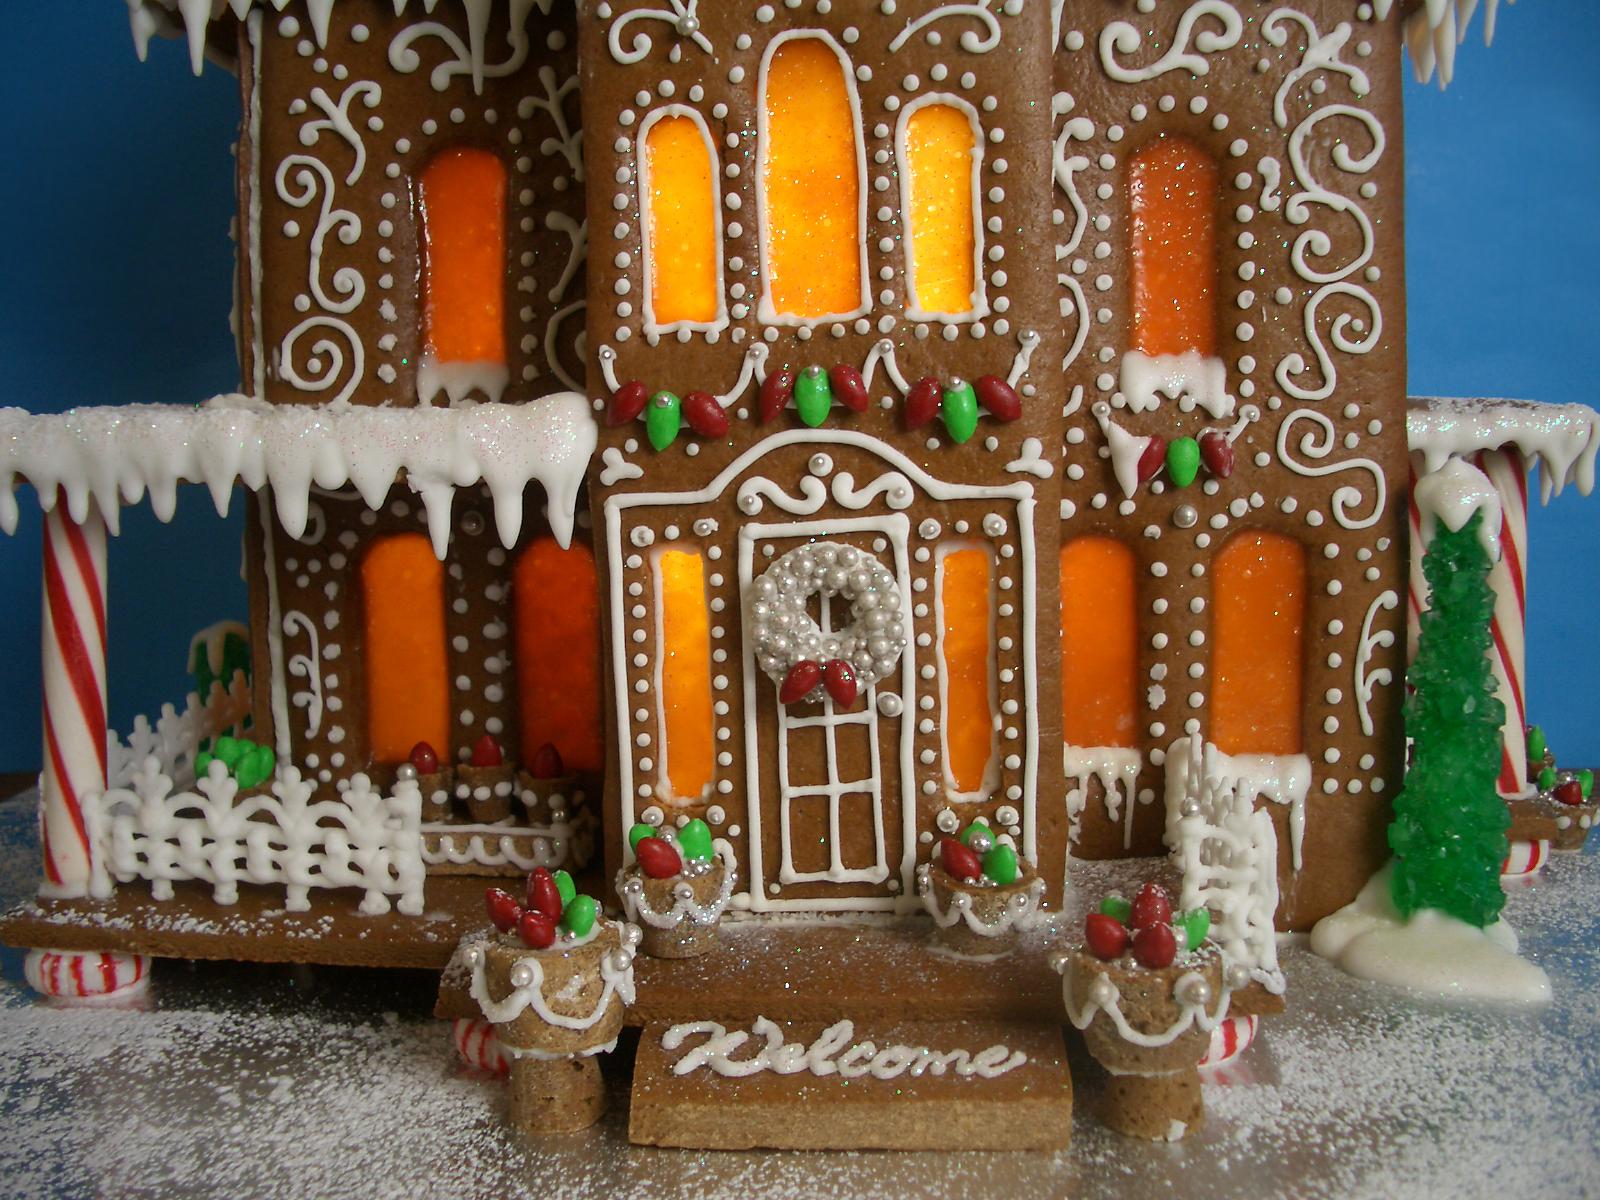 Gingerbread House - 2011 - Goos By Anna on fudge box, ginger box, brownies box, cookie dough box, halloween box, gumbo box, rose box, church box, cupcake house box, biscotti box, pig roast box, candy box, text box, fireplace box, ornament box, icing box, panettone box, giveaway box, butterfly box, tiramisu box,